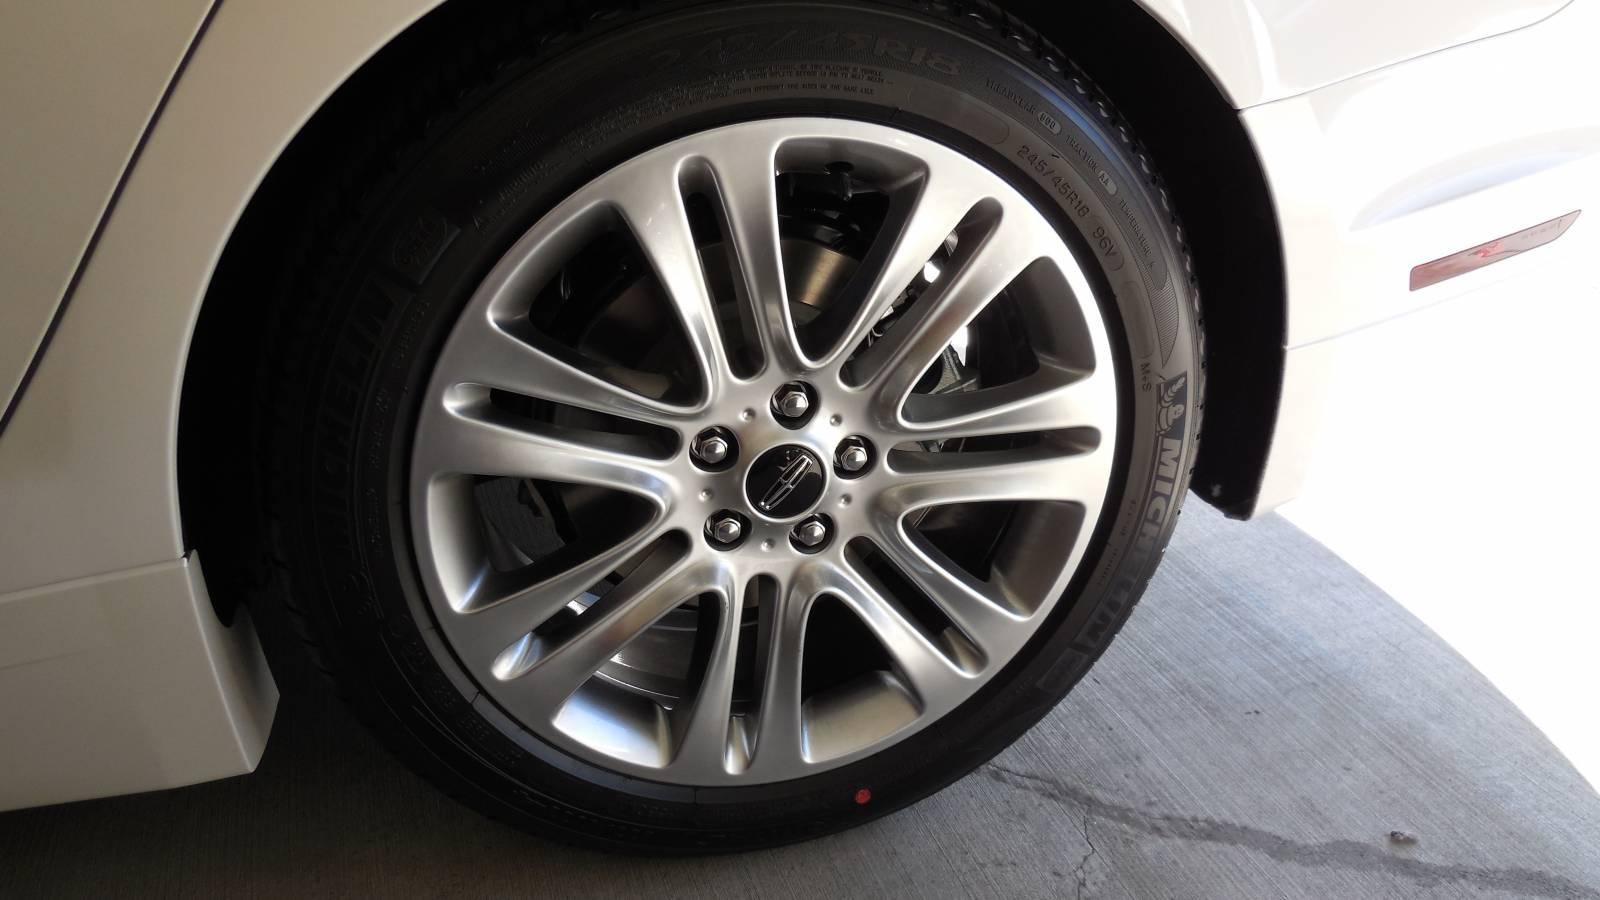 Rear Left Tire & Rim